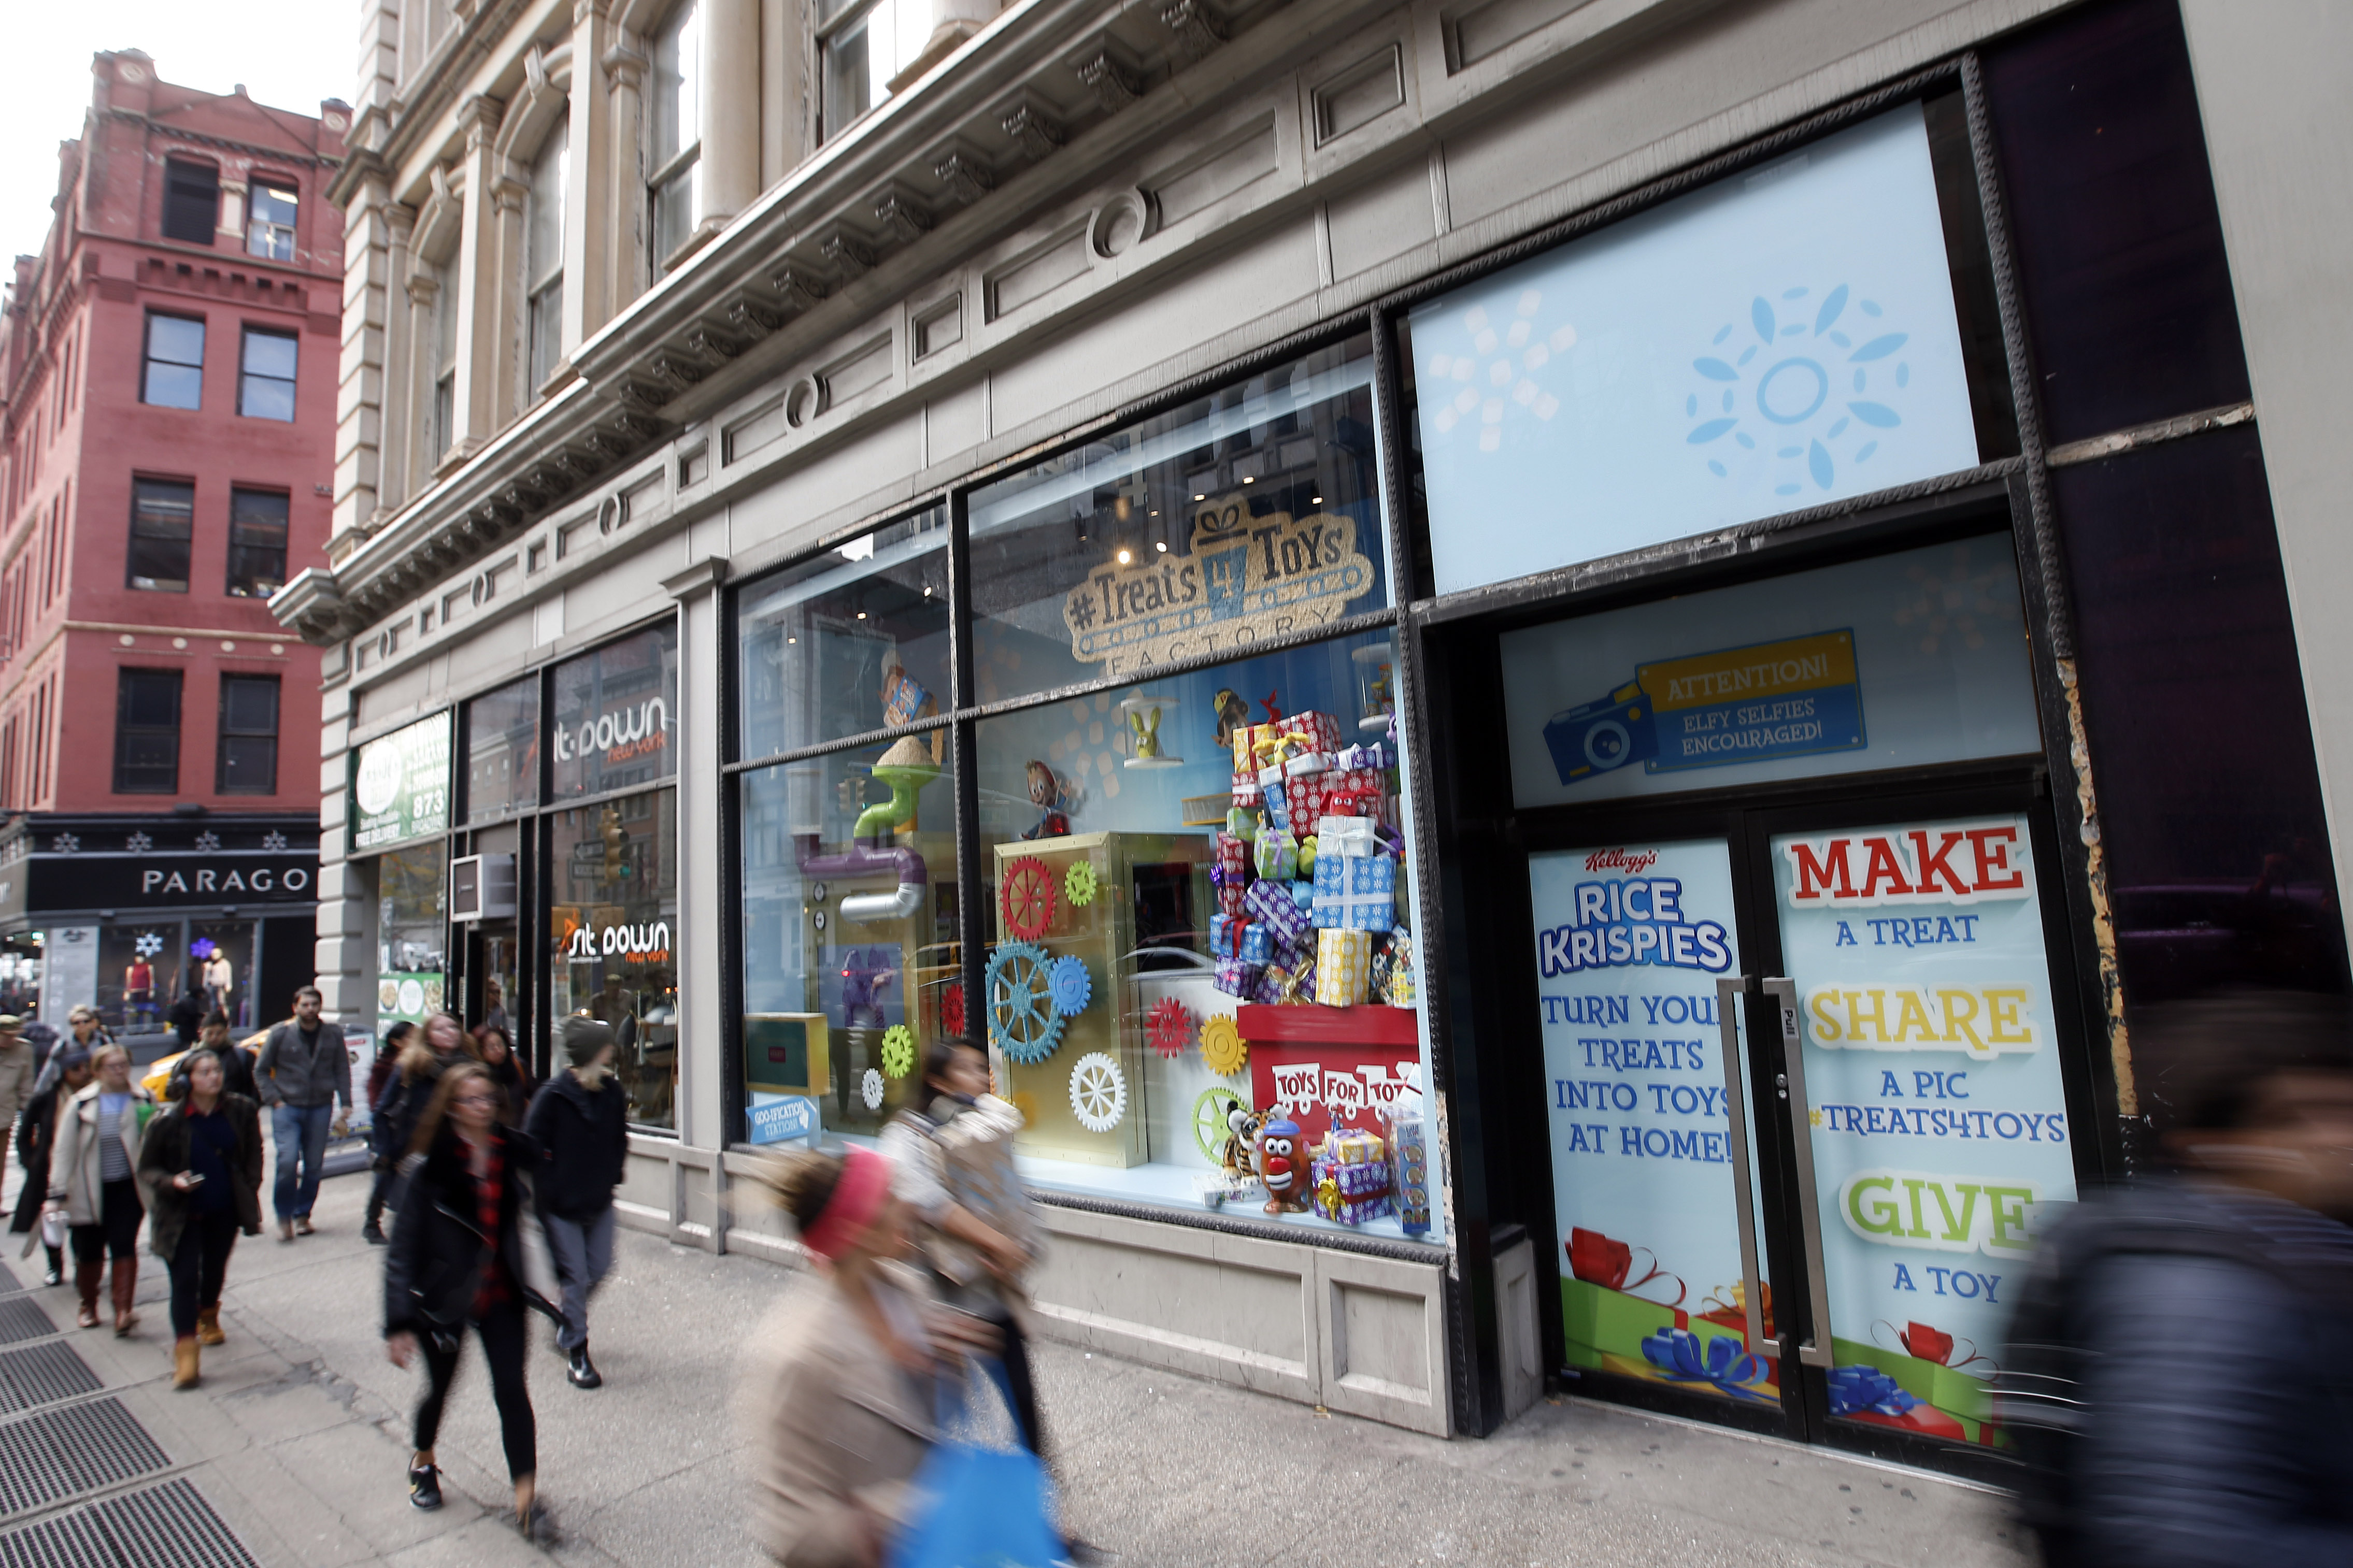 Kellogg's Rice Krispies Treats 4 Toys Holiday Window